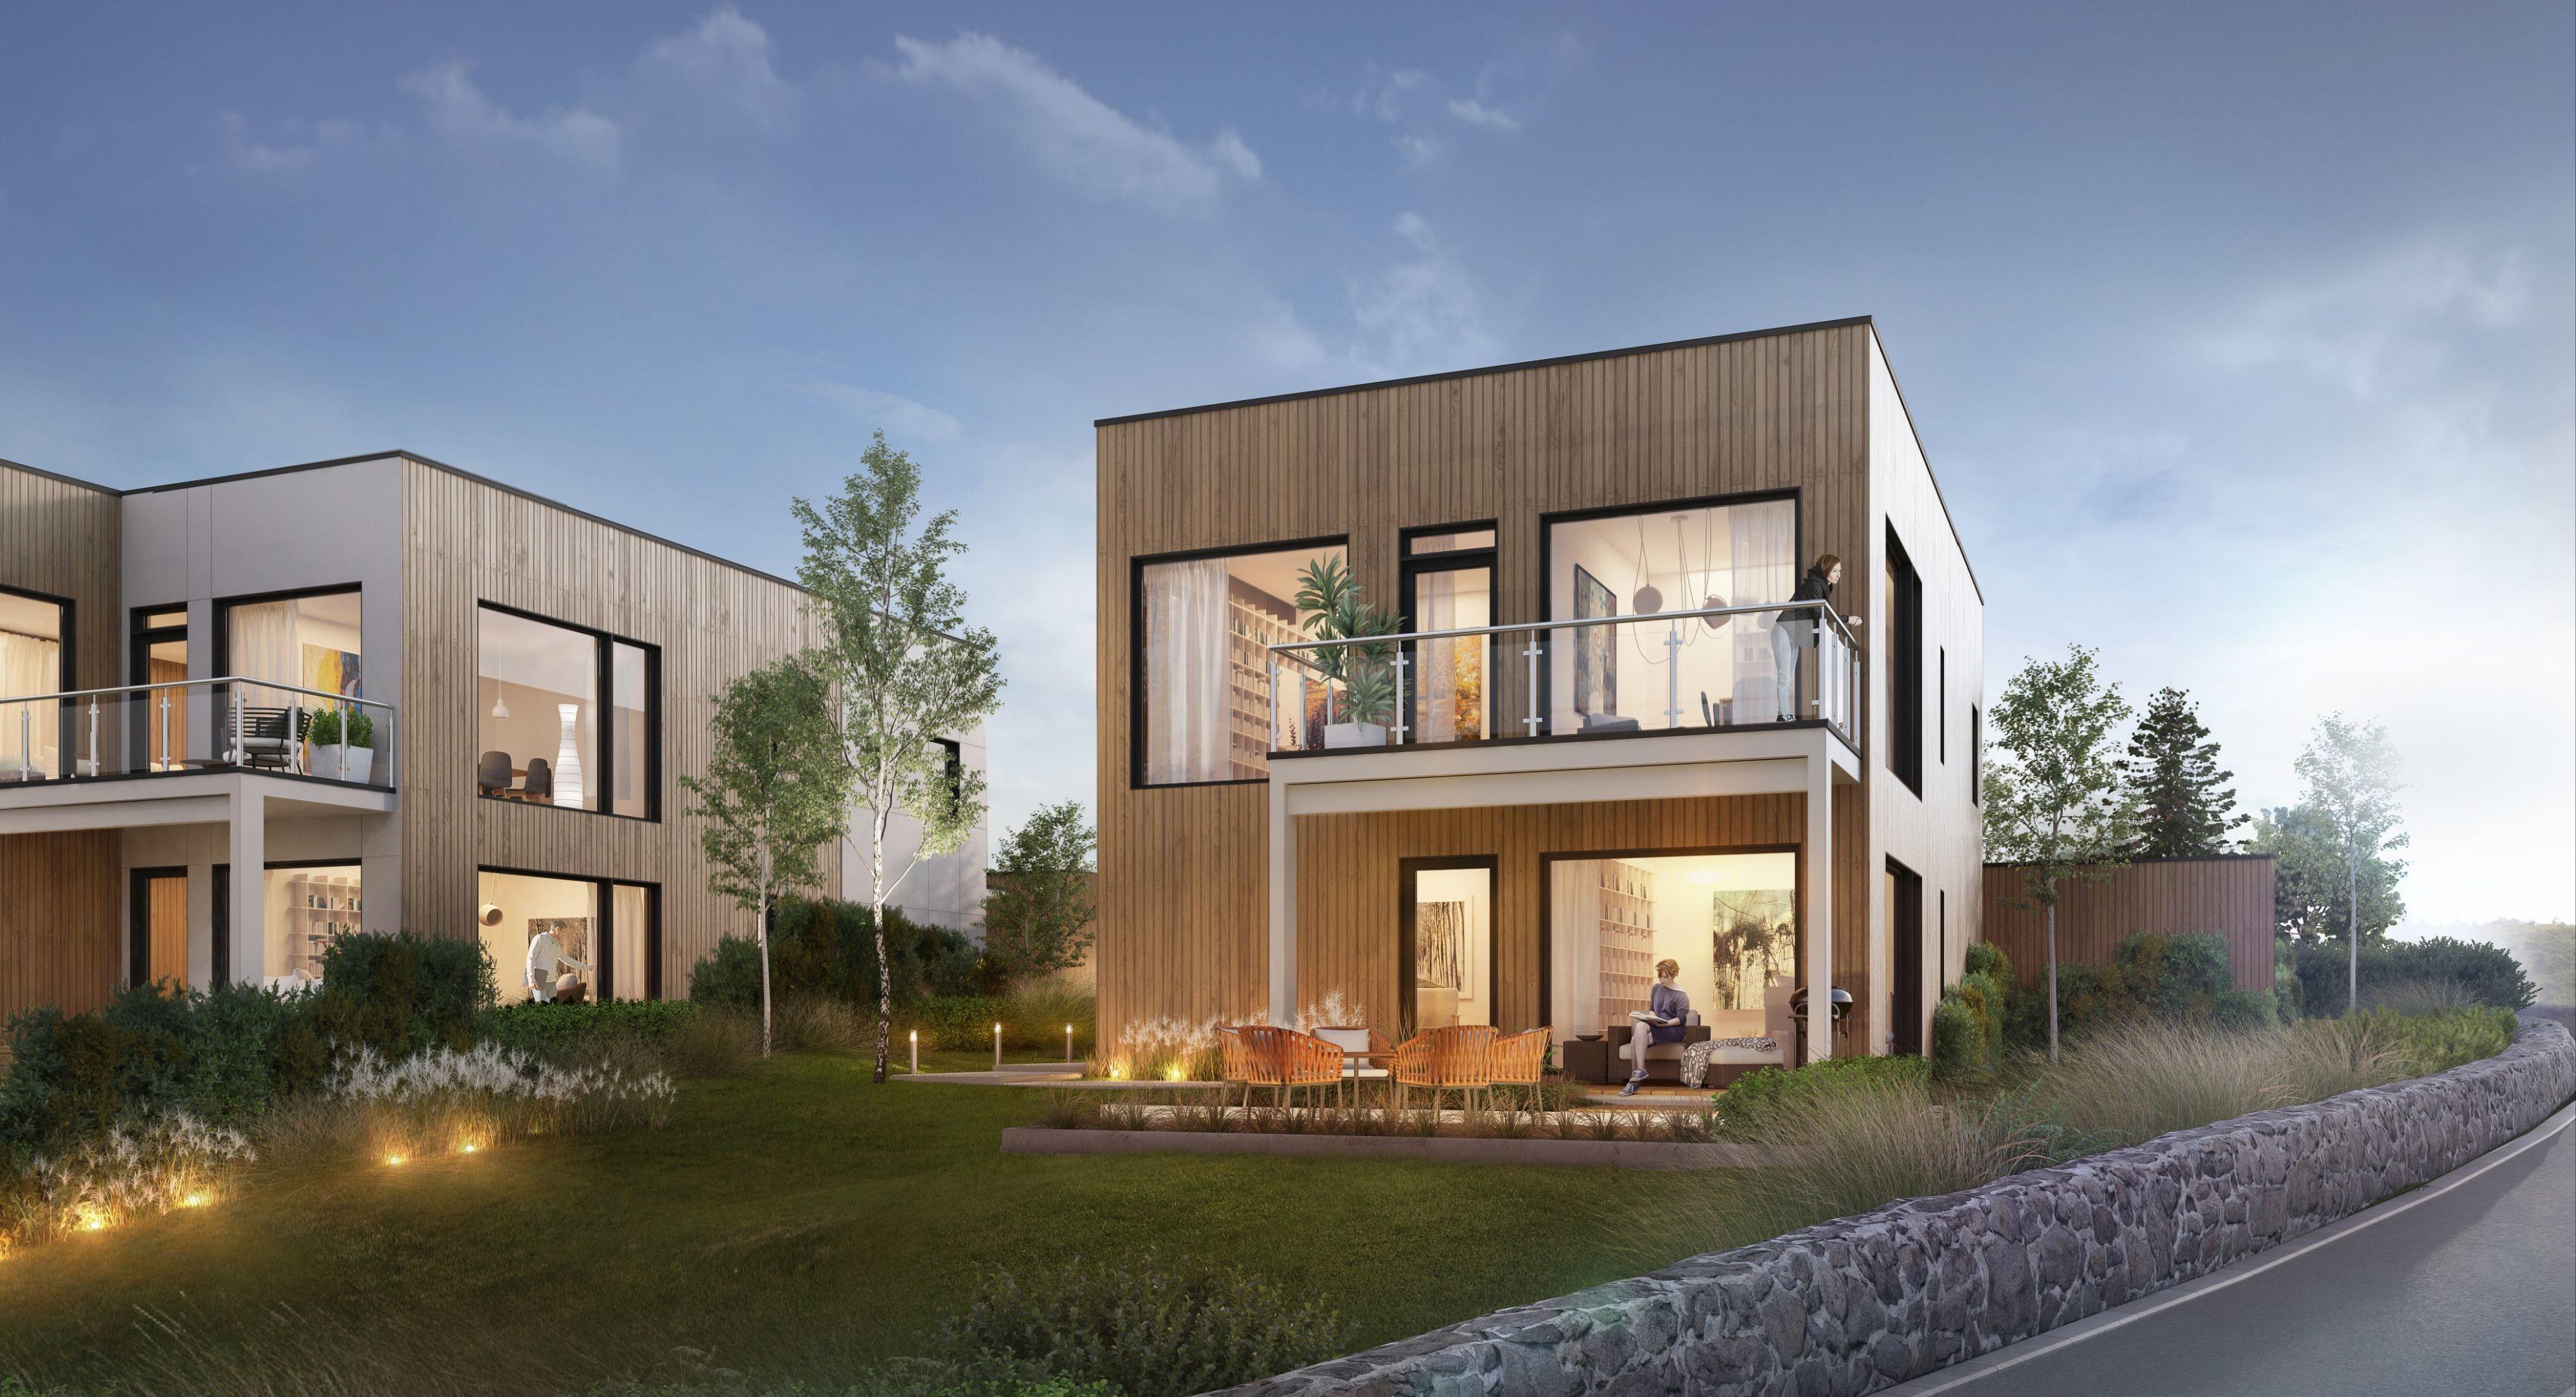 Snøde / Tananger - 2 familievennlige byggeklare enebolig tomter i attraktiv område for salg. Pris kr 2.400.000,-